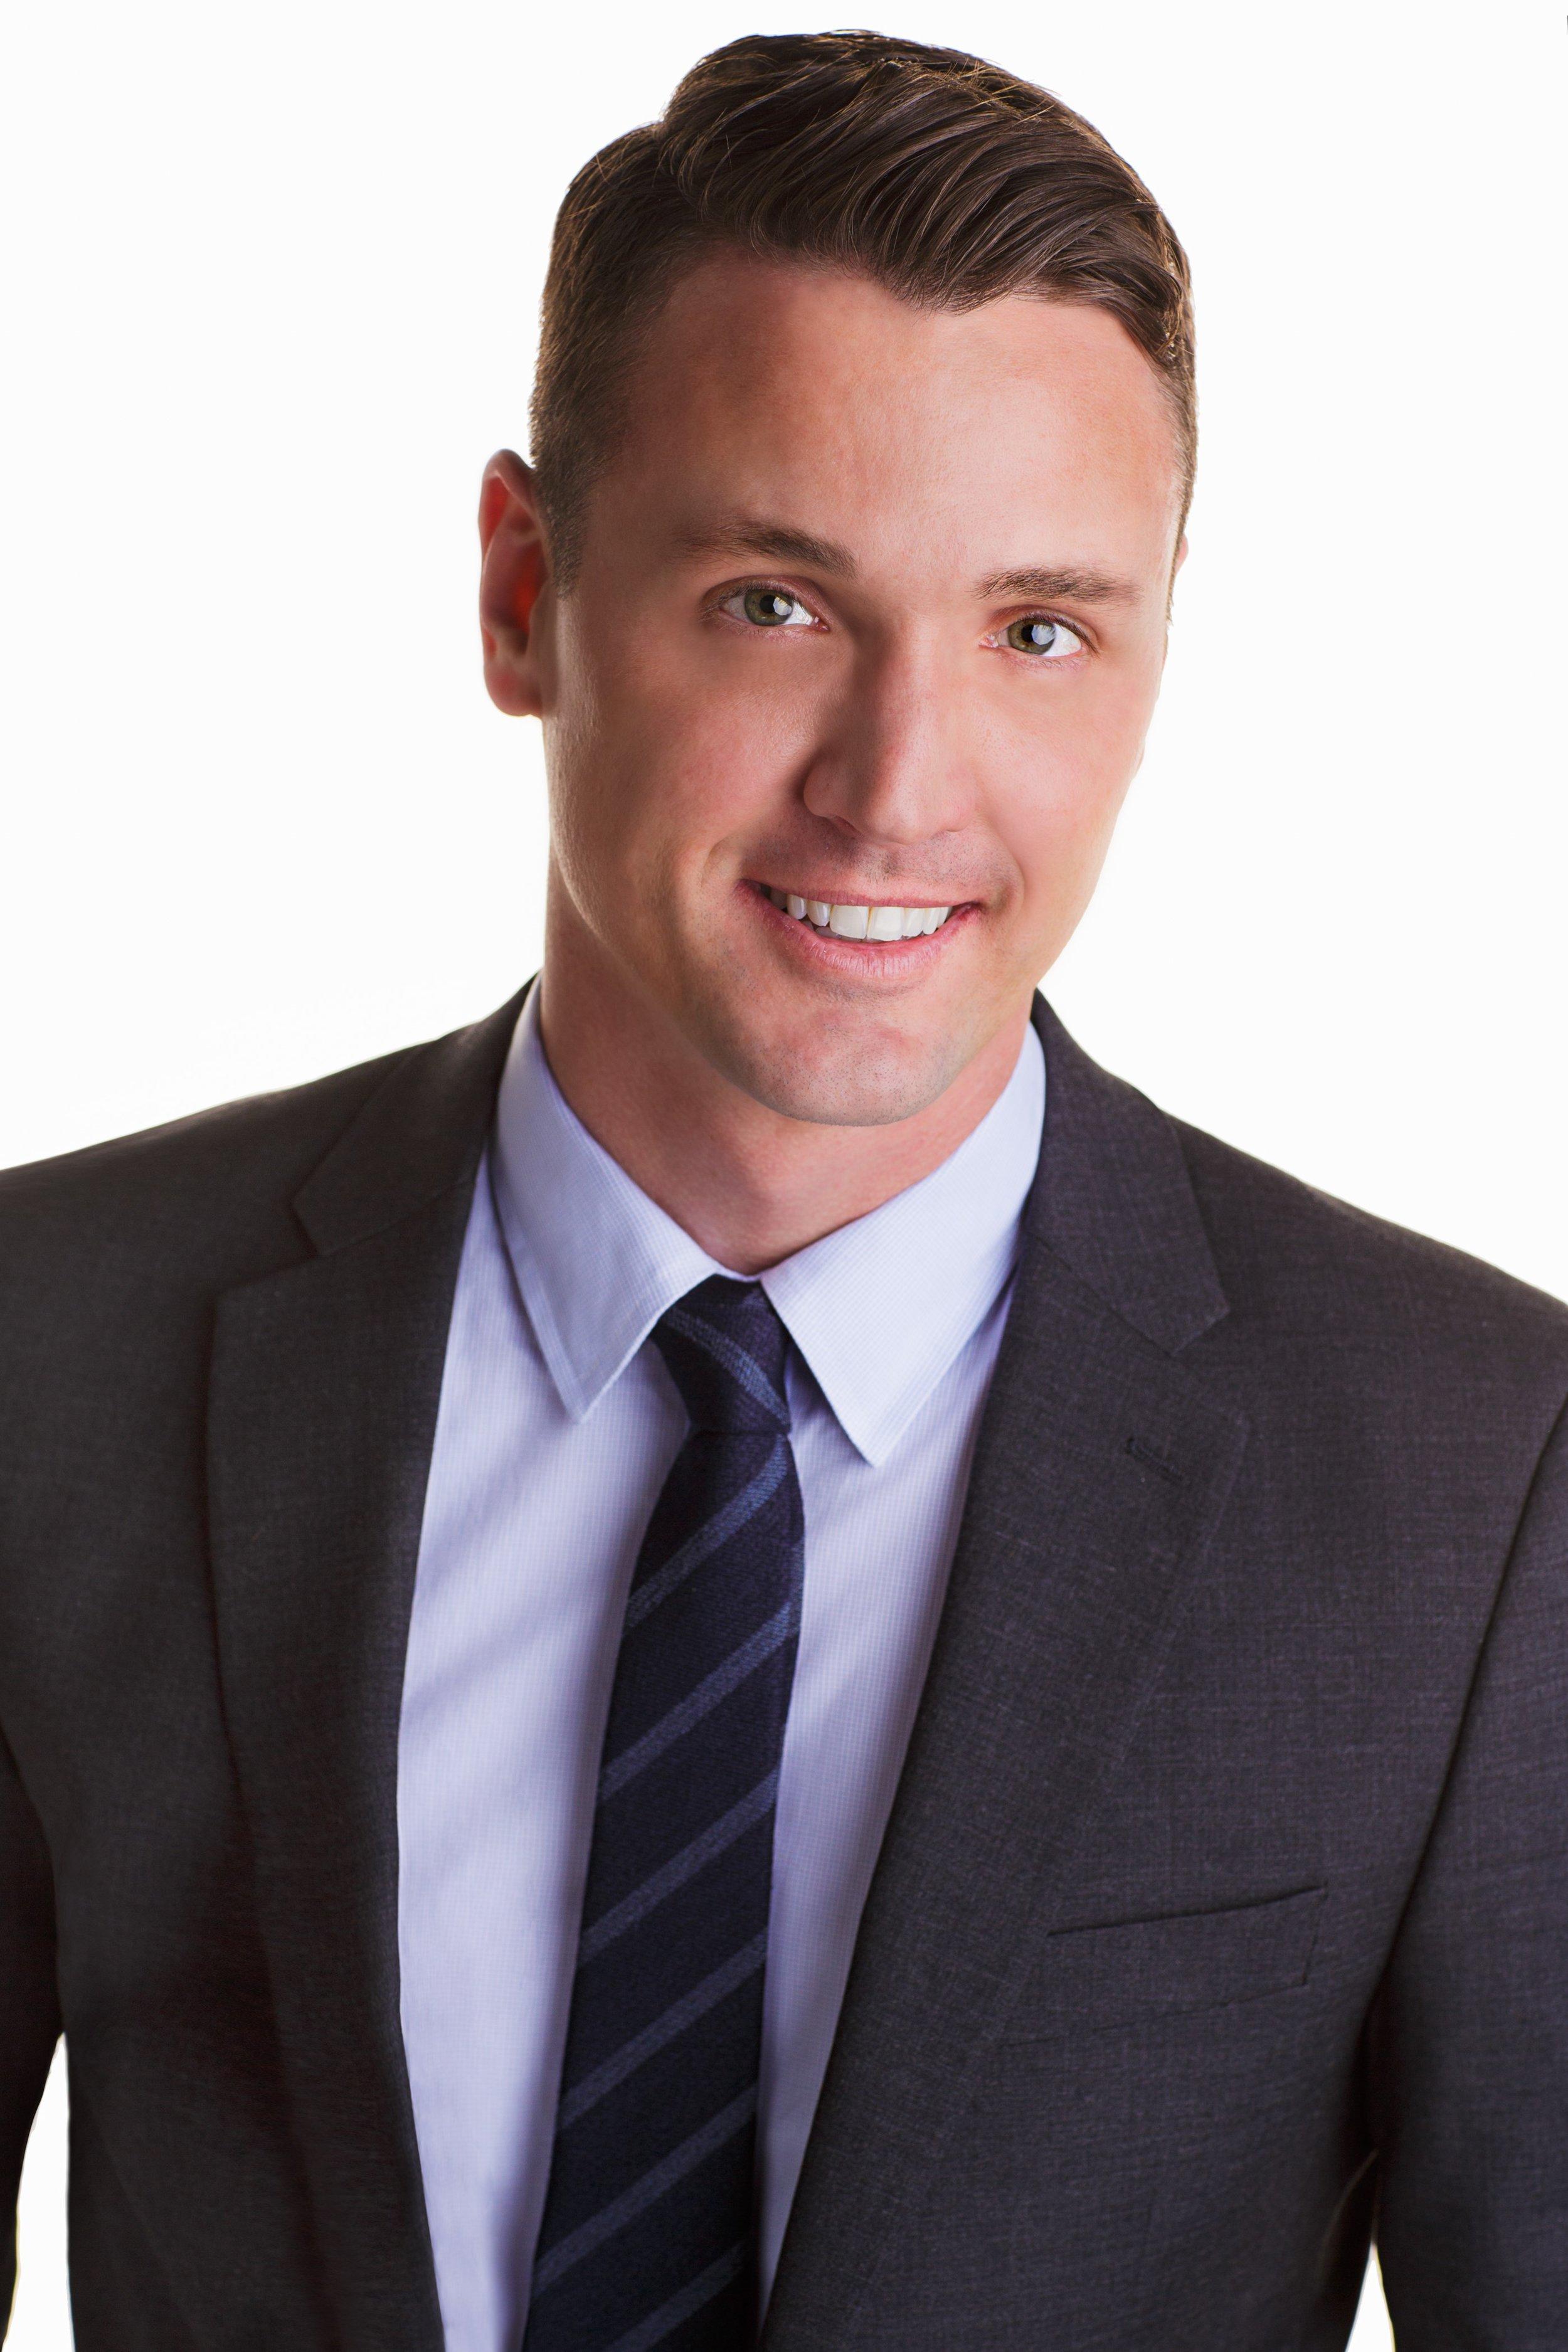 Matthew Slosar